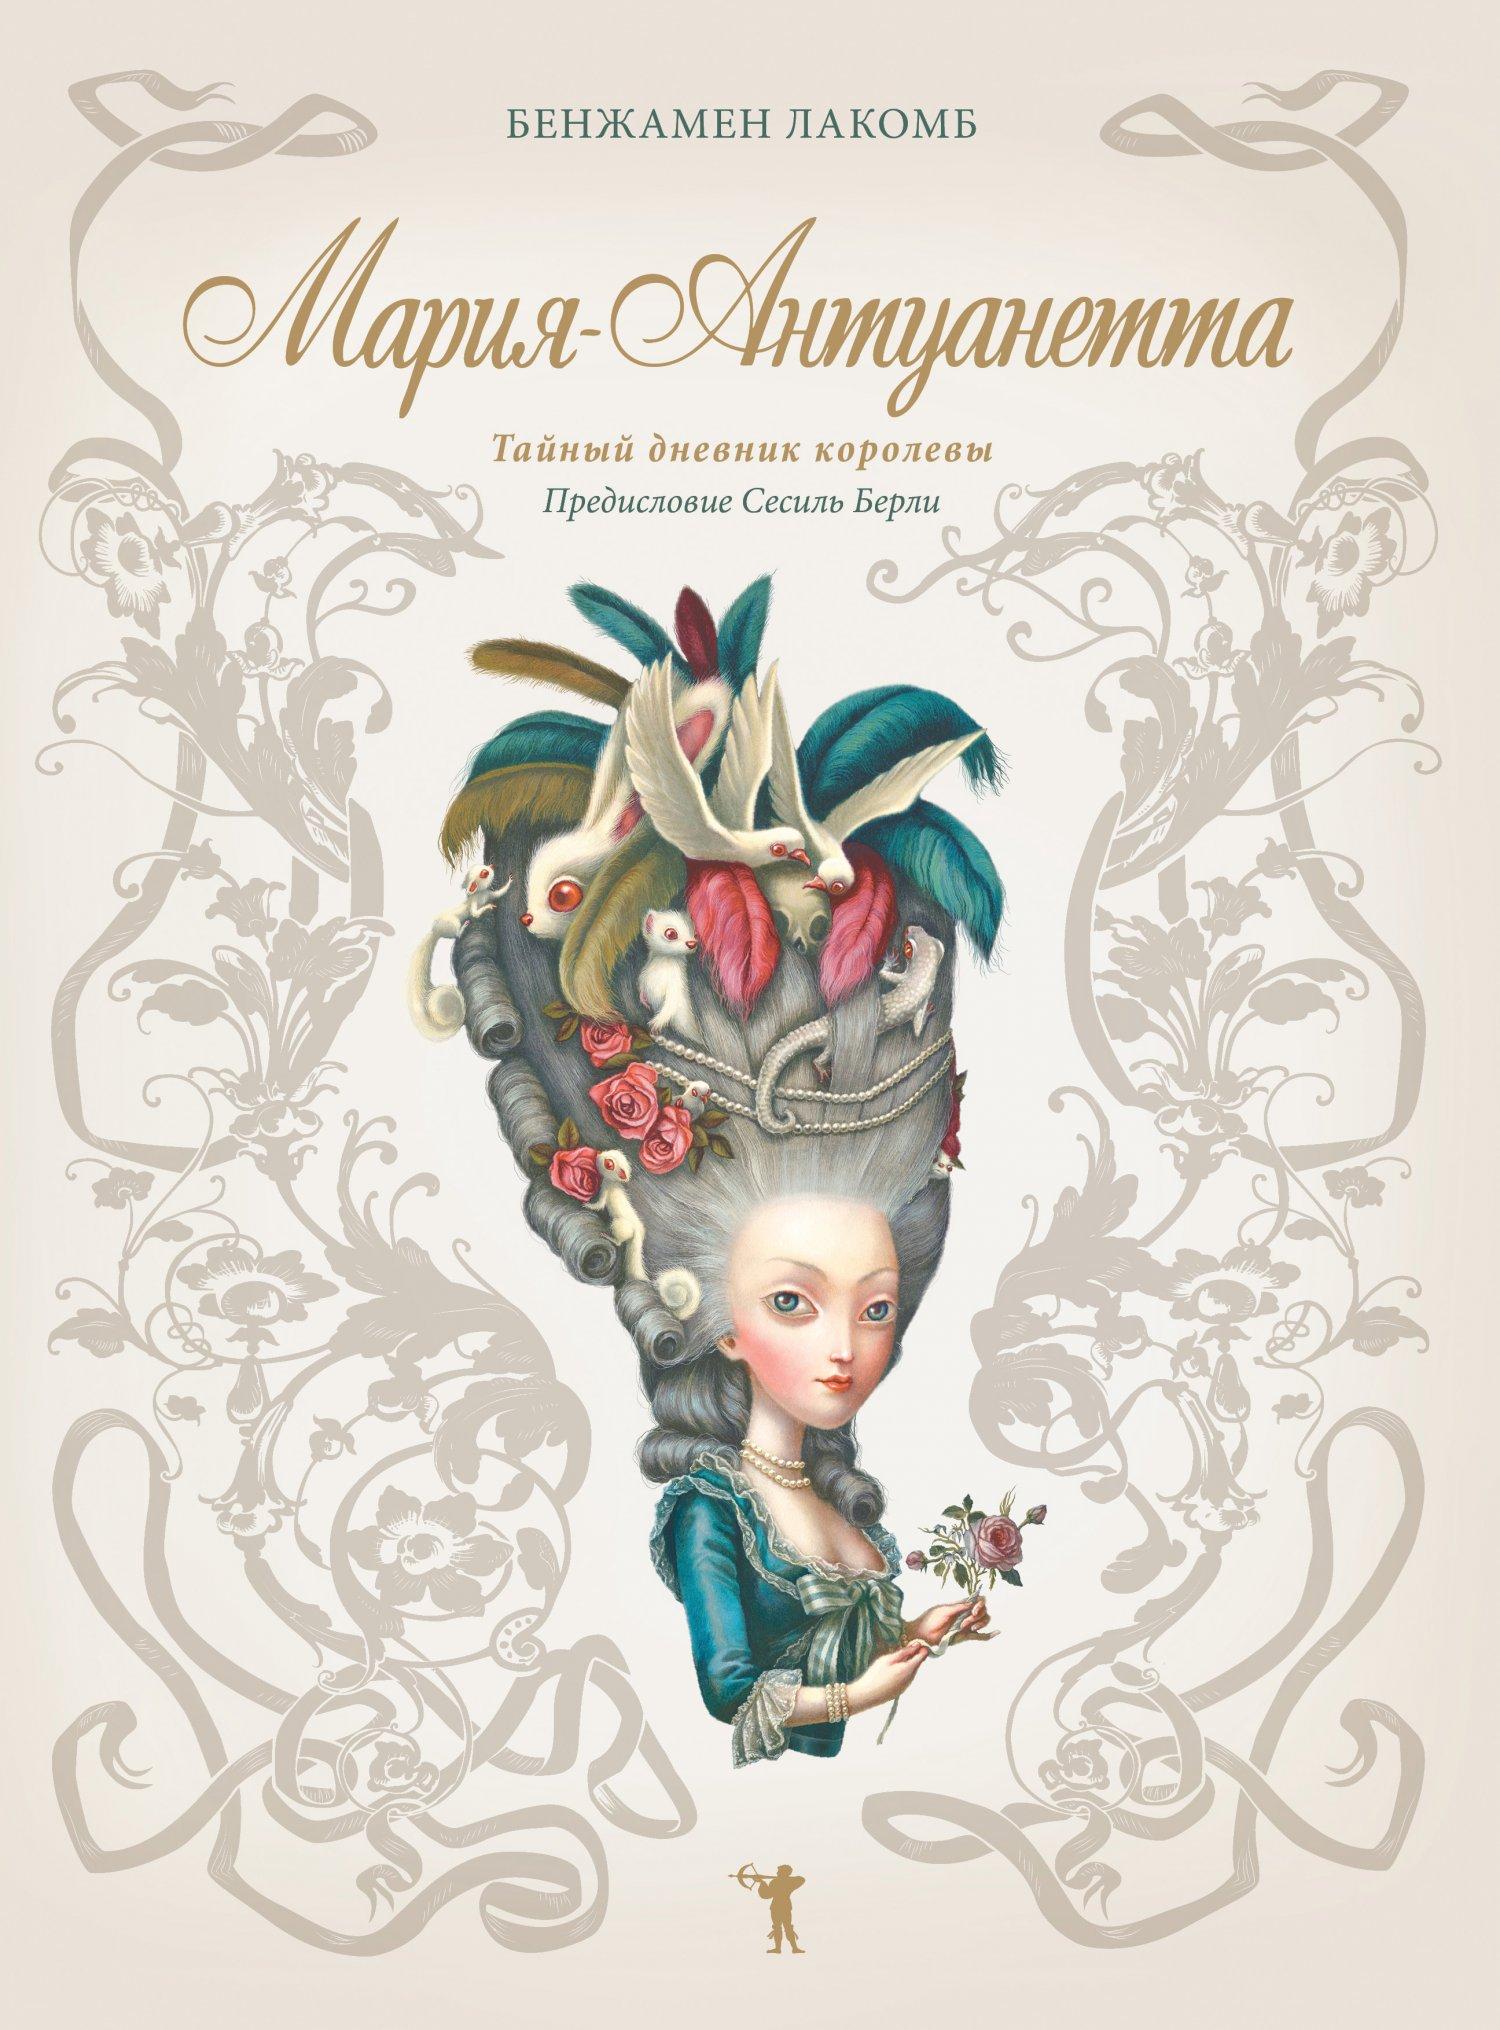 Бенжамен Лакомб Мария-Антуанетта. Тайный дневник королевы жукова гладкова мария все могут королевы роман